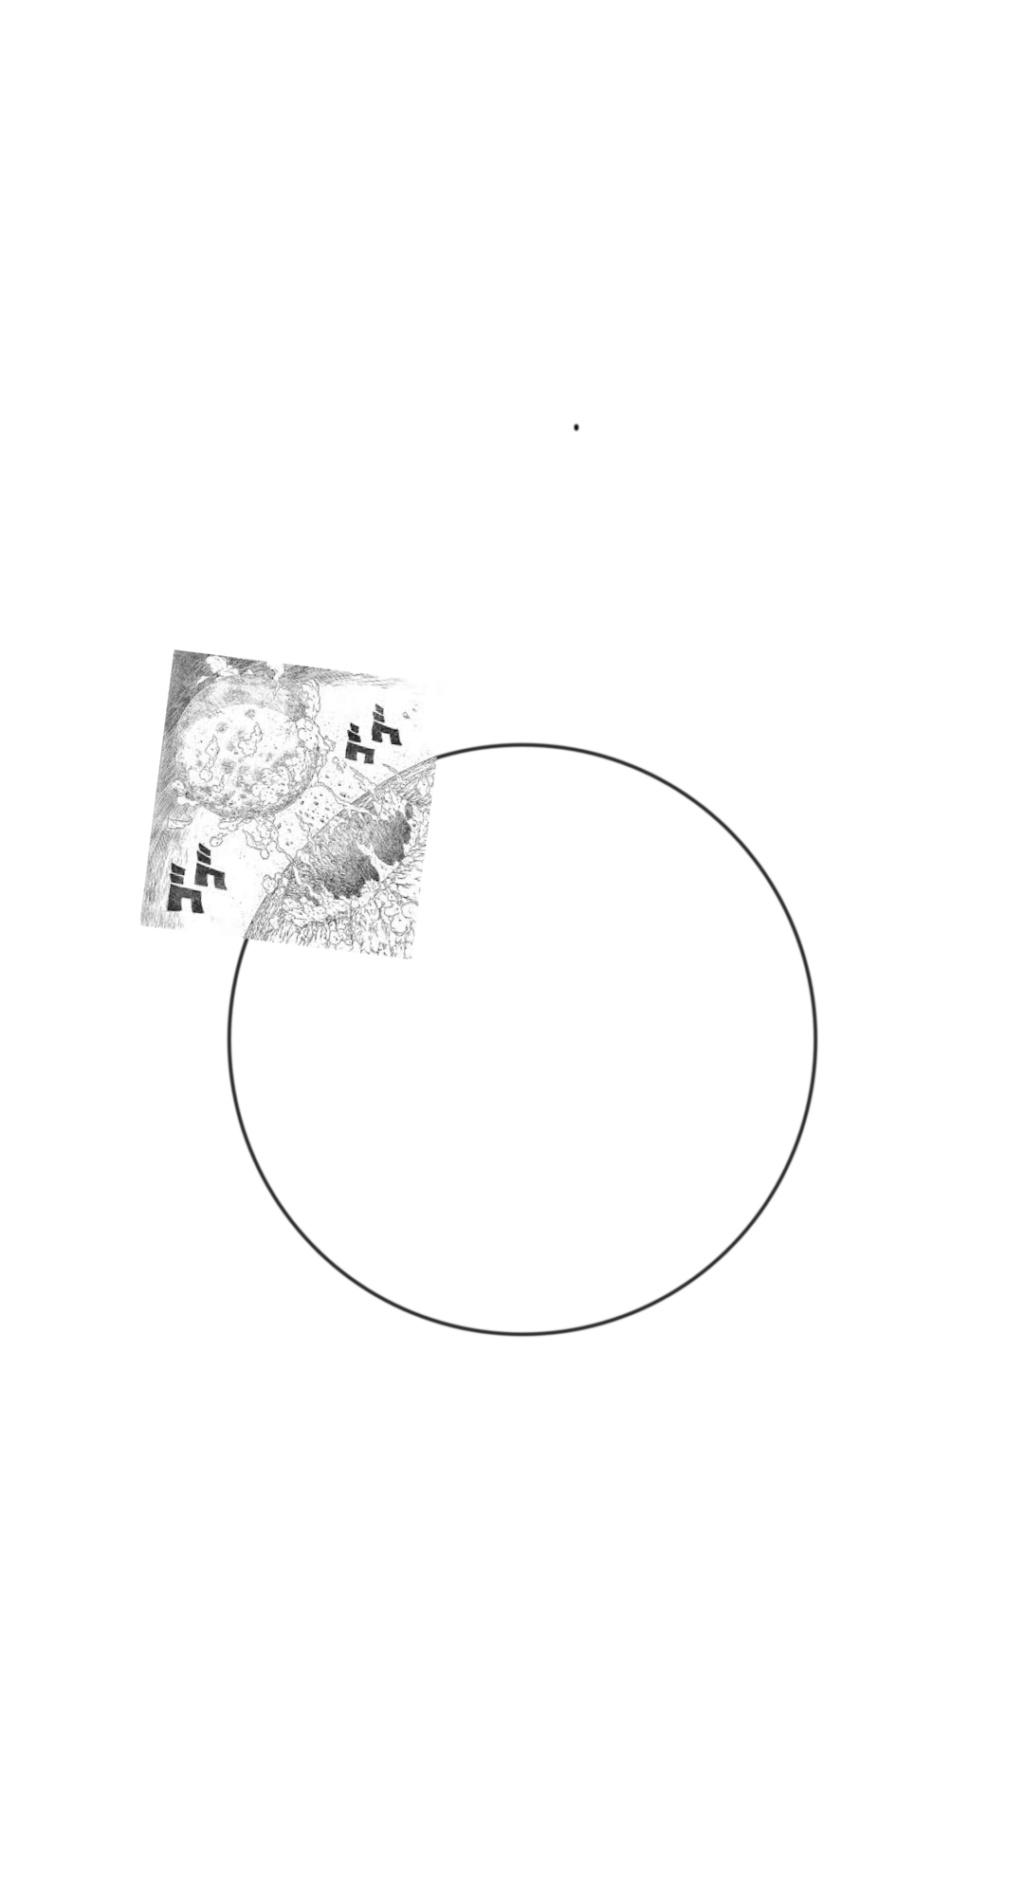 Kaguya ootsutsuki vs kid boo - Página 5 24773810